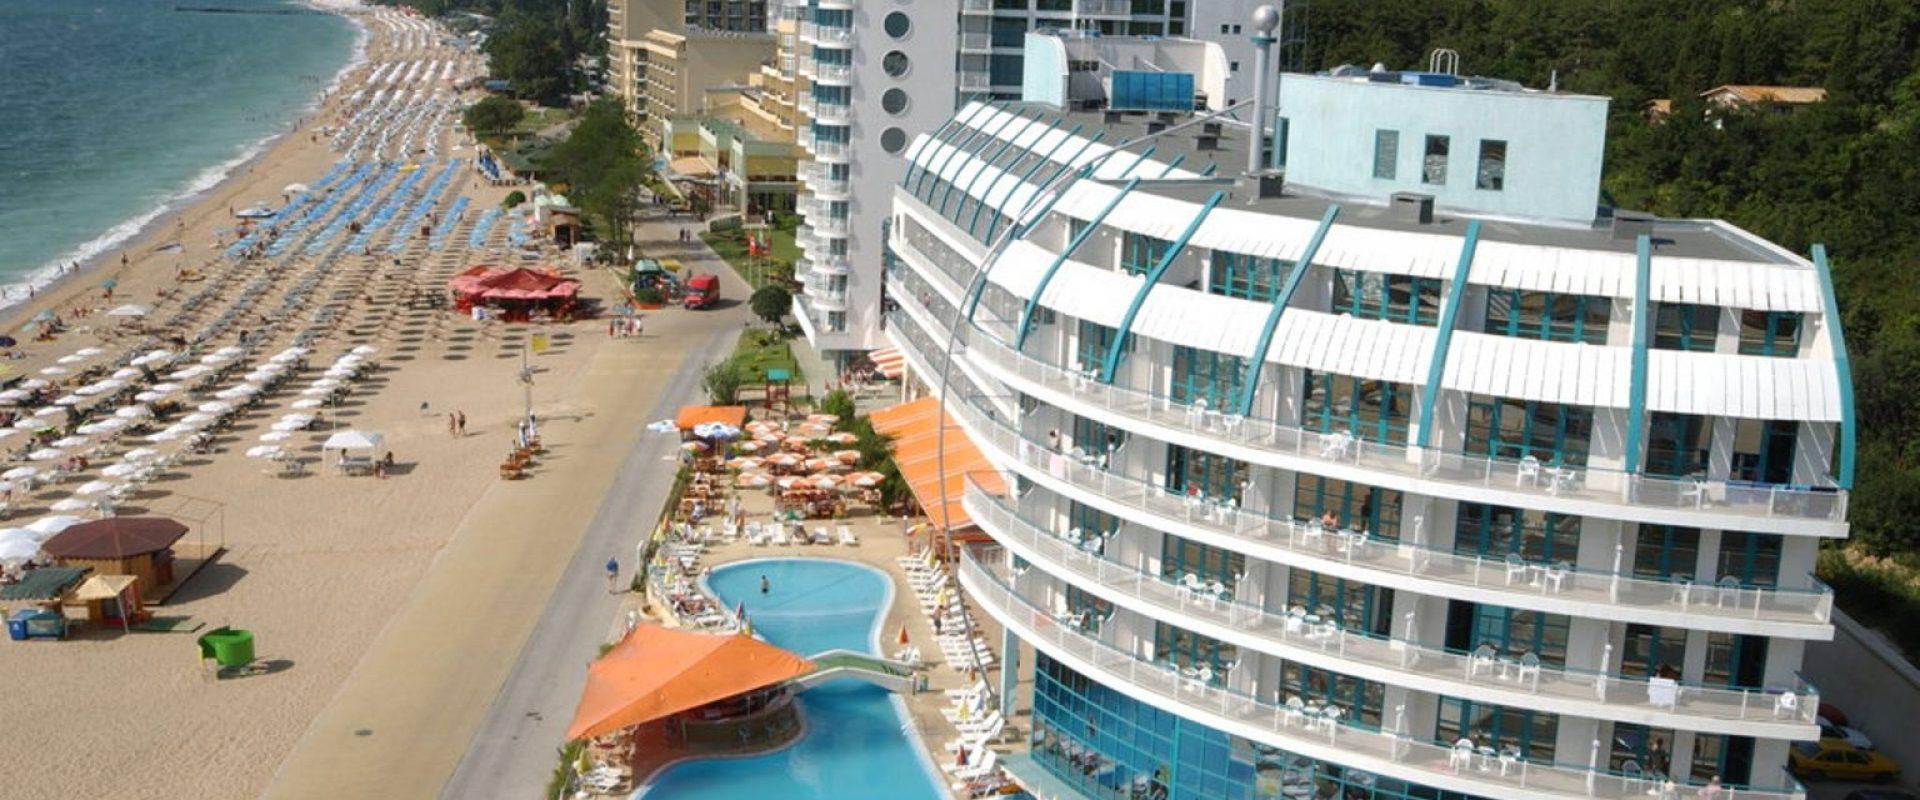 Odihnă în Bulgaria, Golden Sands, Hotel Berlin Golden Beach